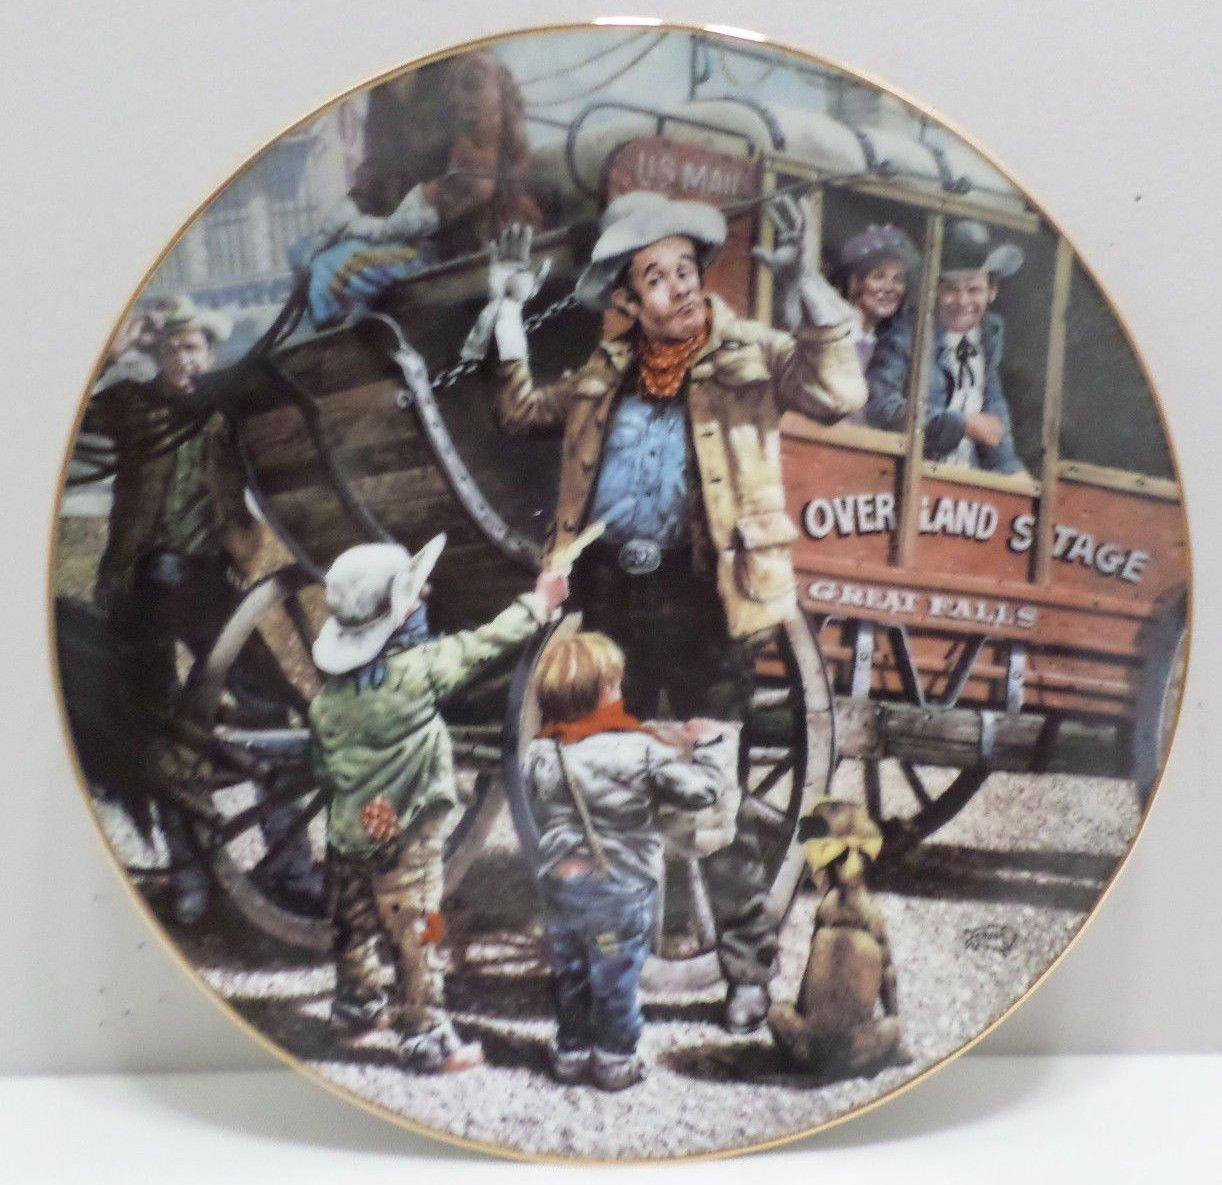 1986 Collector Plate The Desperadoes by Don Crook The Hamilton Collection